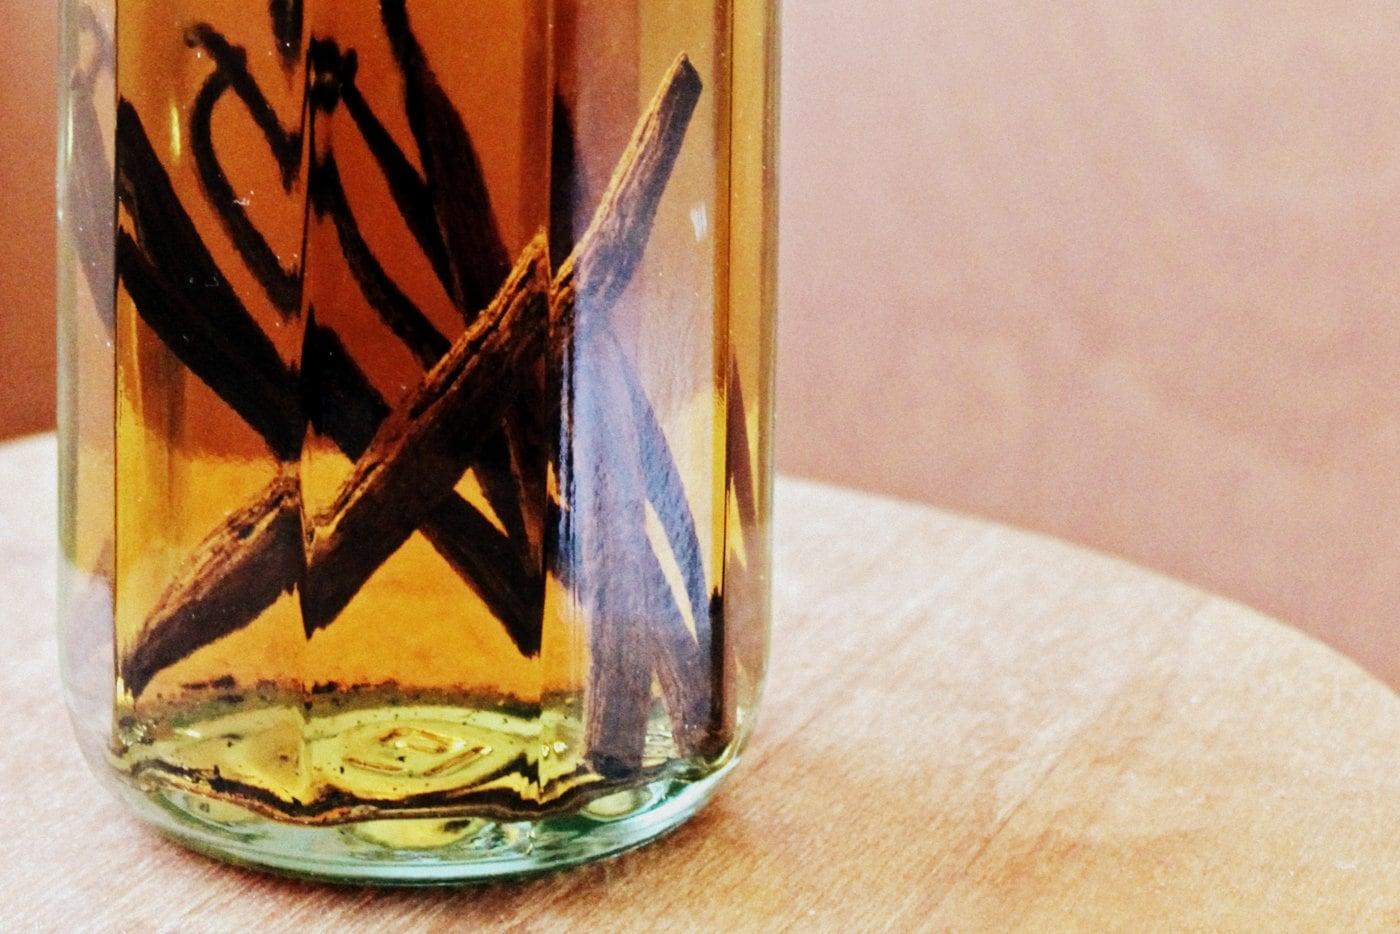 Brewing homemade vanilla extract